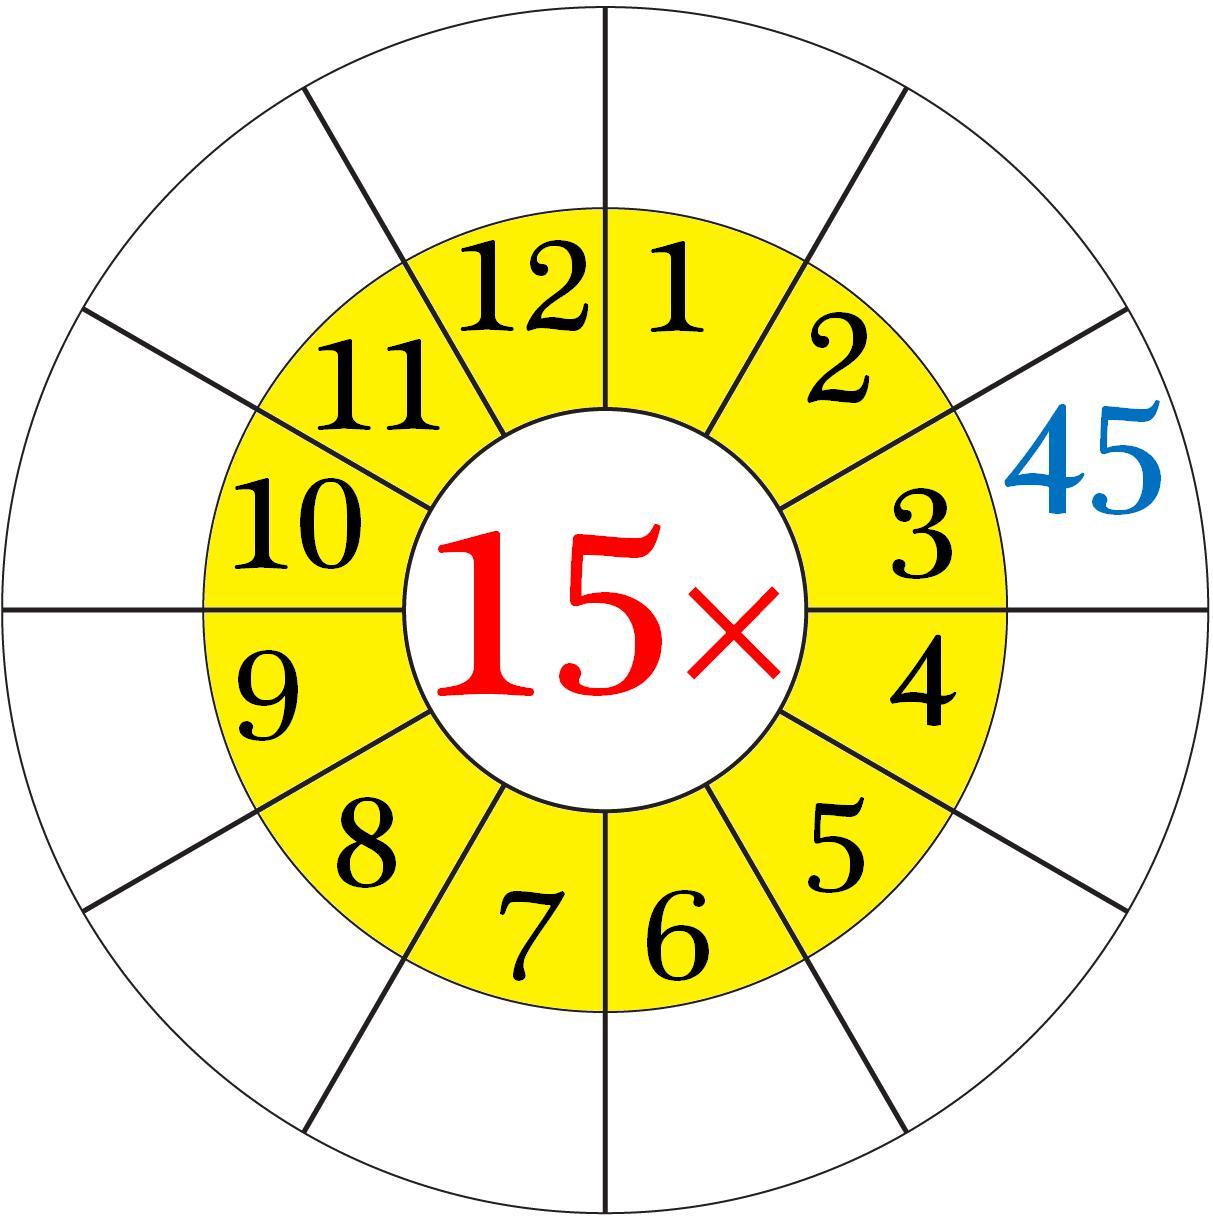 Worksheet on Multiplication Table of 15